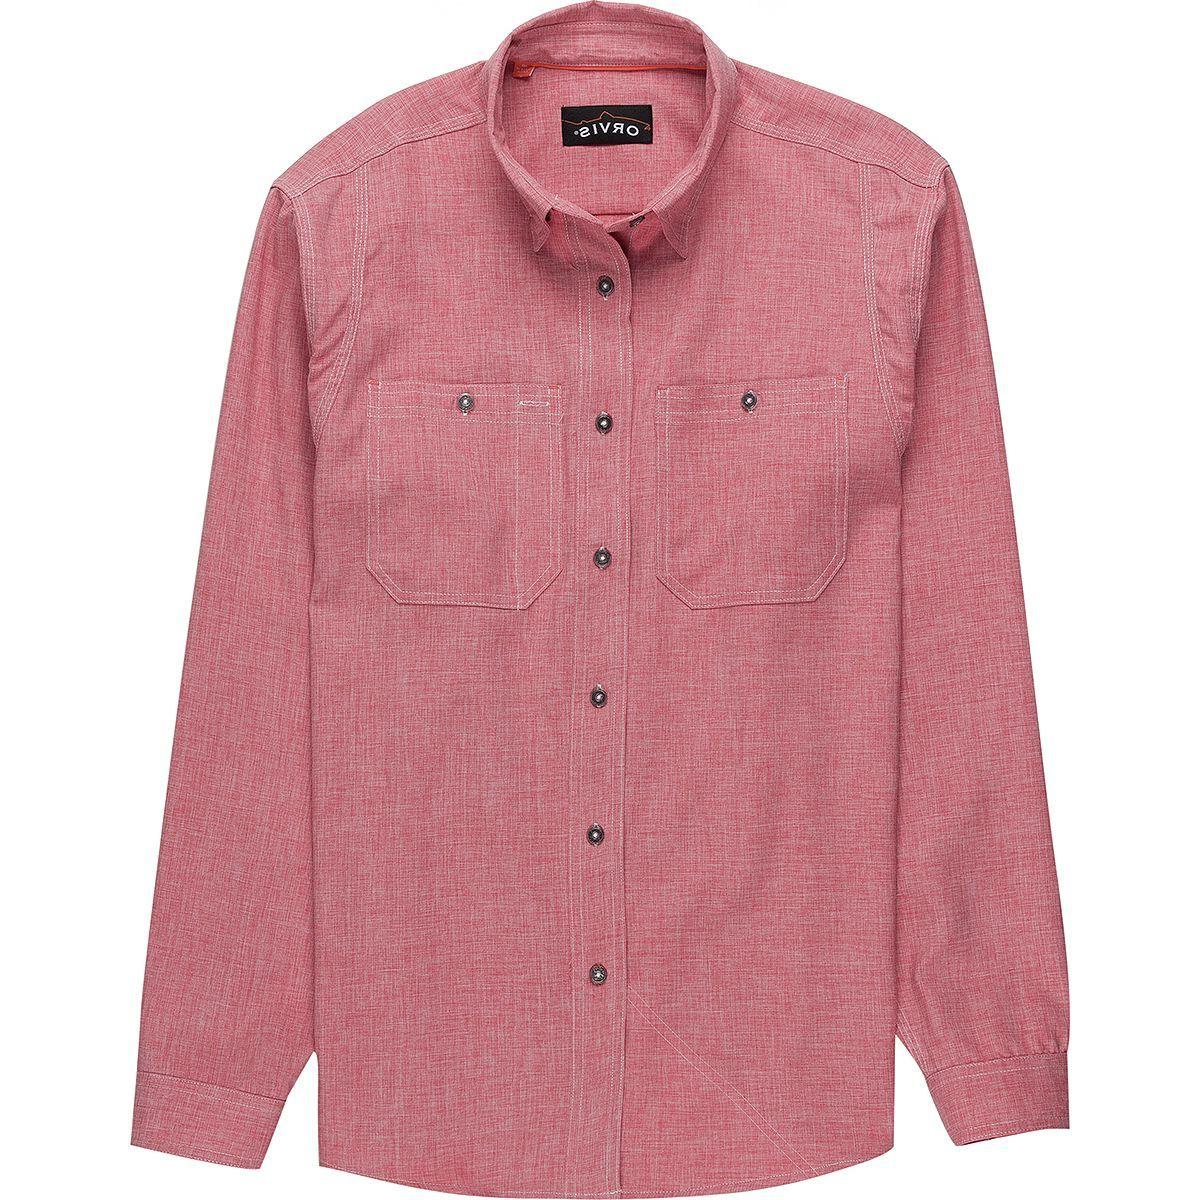 Orvis Tech Chambray Work Shirt - Men's